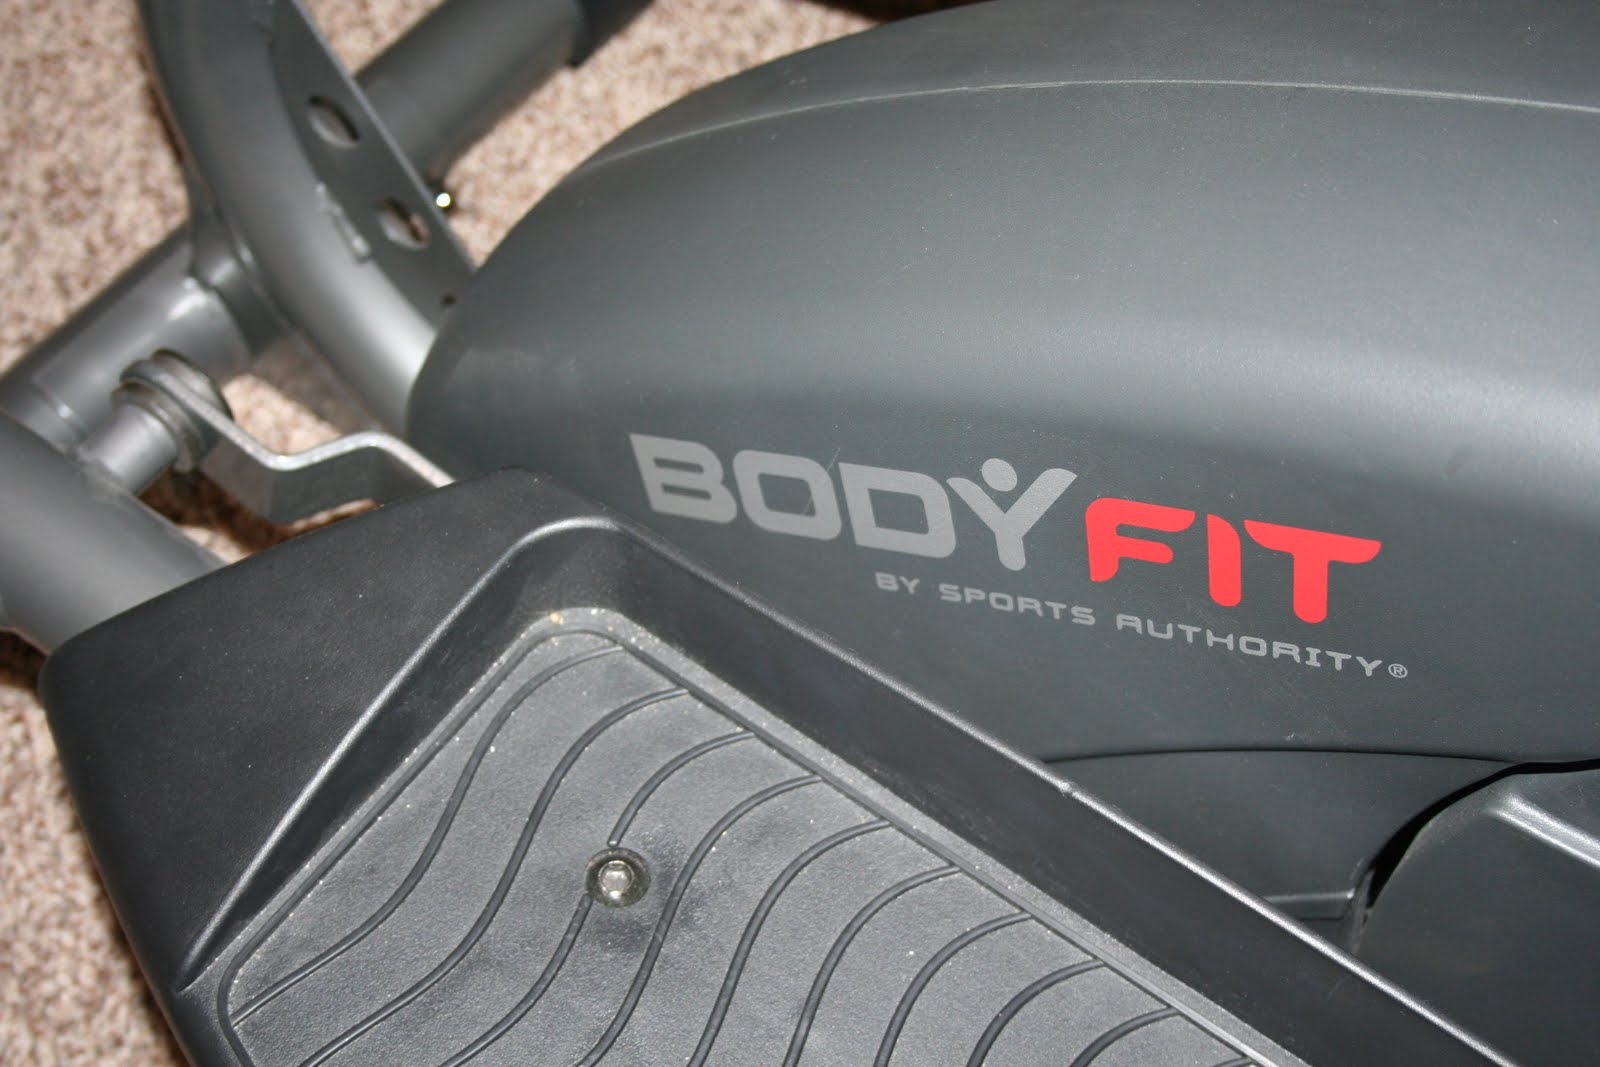 Download bodyfit bike manuals   diigo groups.